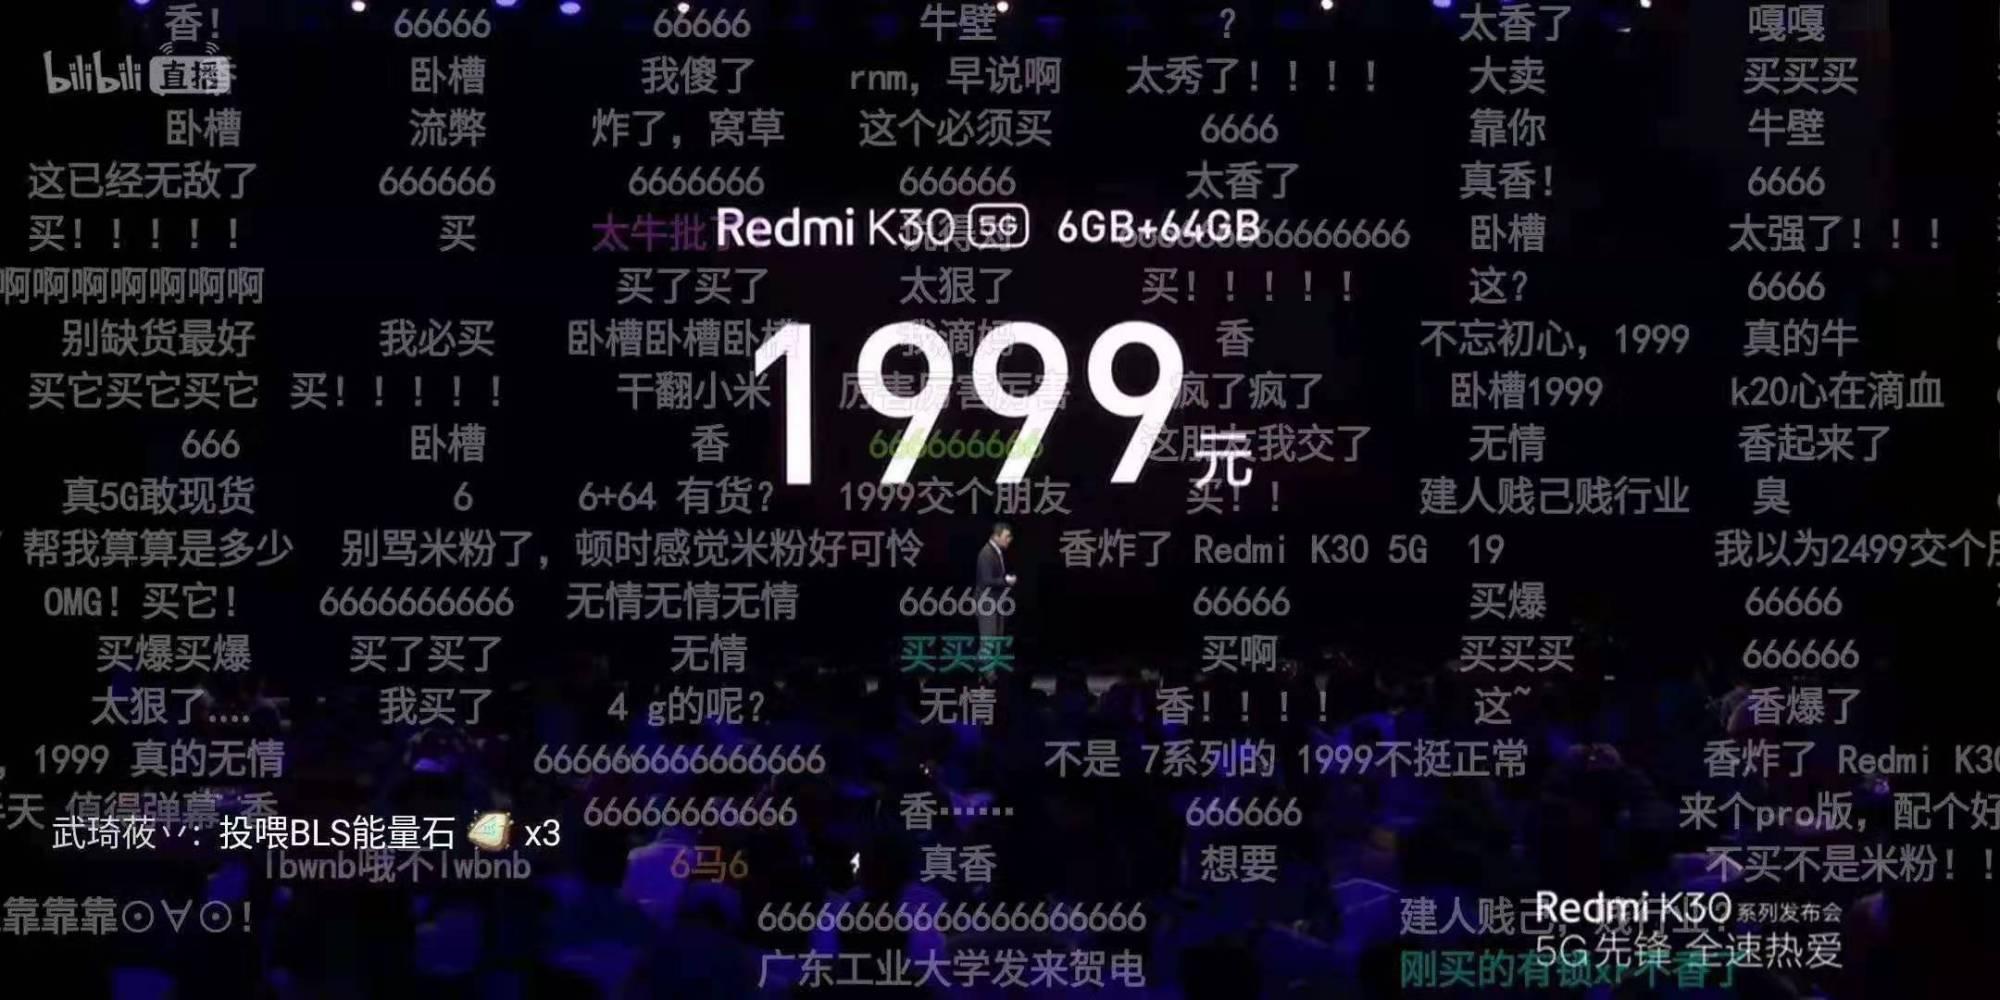 小米捅破5G的天!1999元Redmi K30,讓5G手機提前進入性價比時代